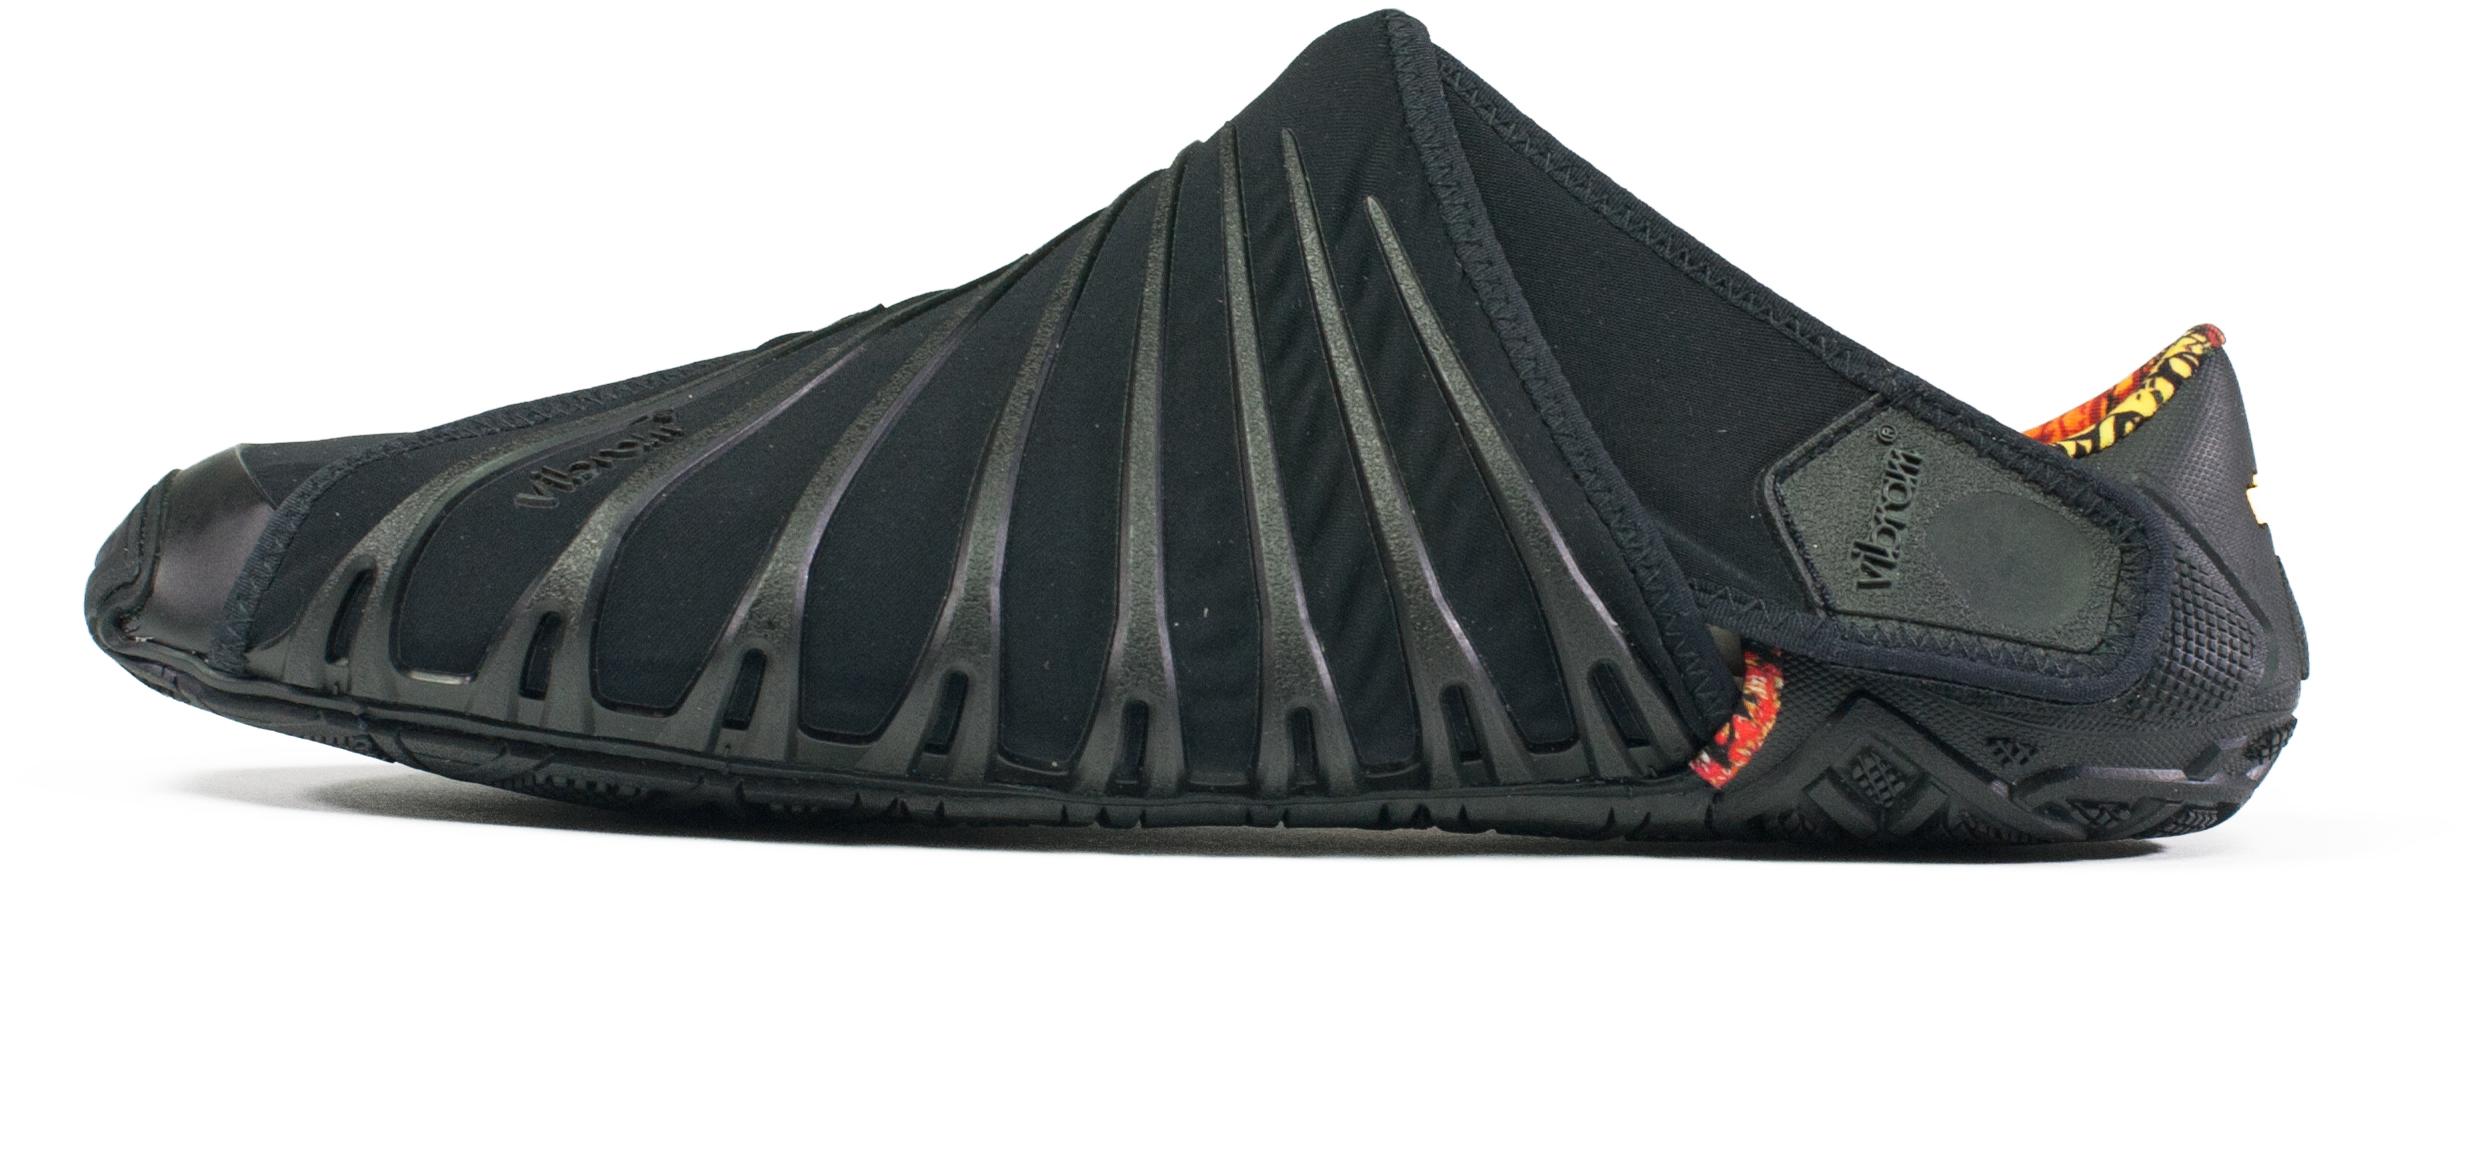 Vibram Furoshiki Original Wrap Semelle Chaussures Unisexe Couleur Noir